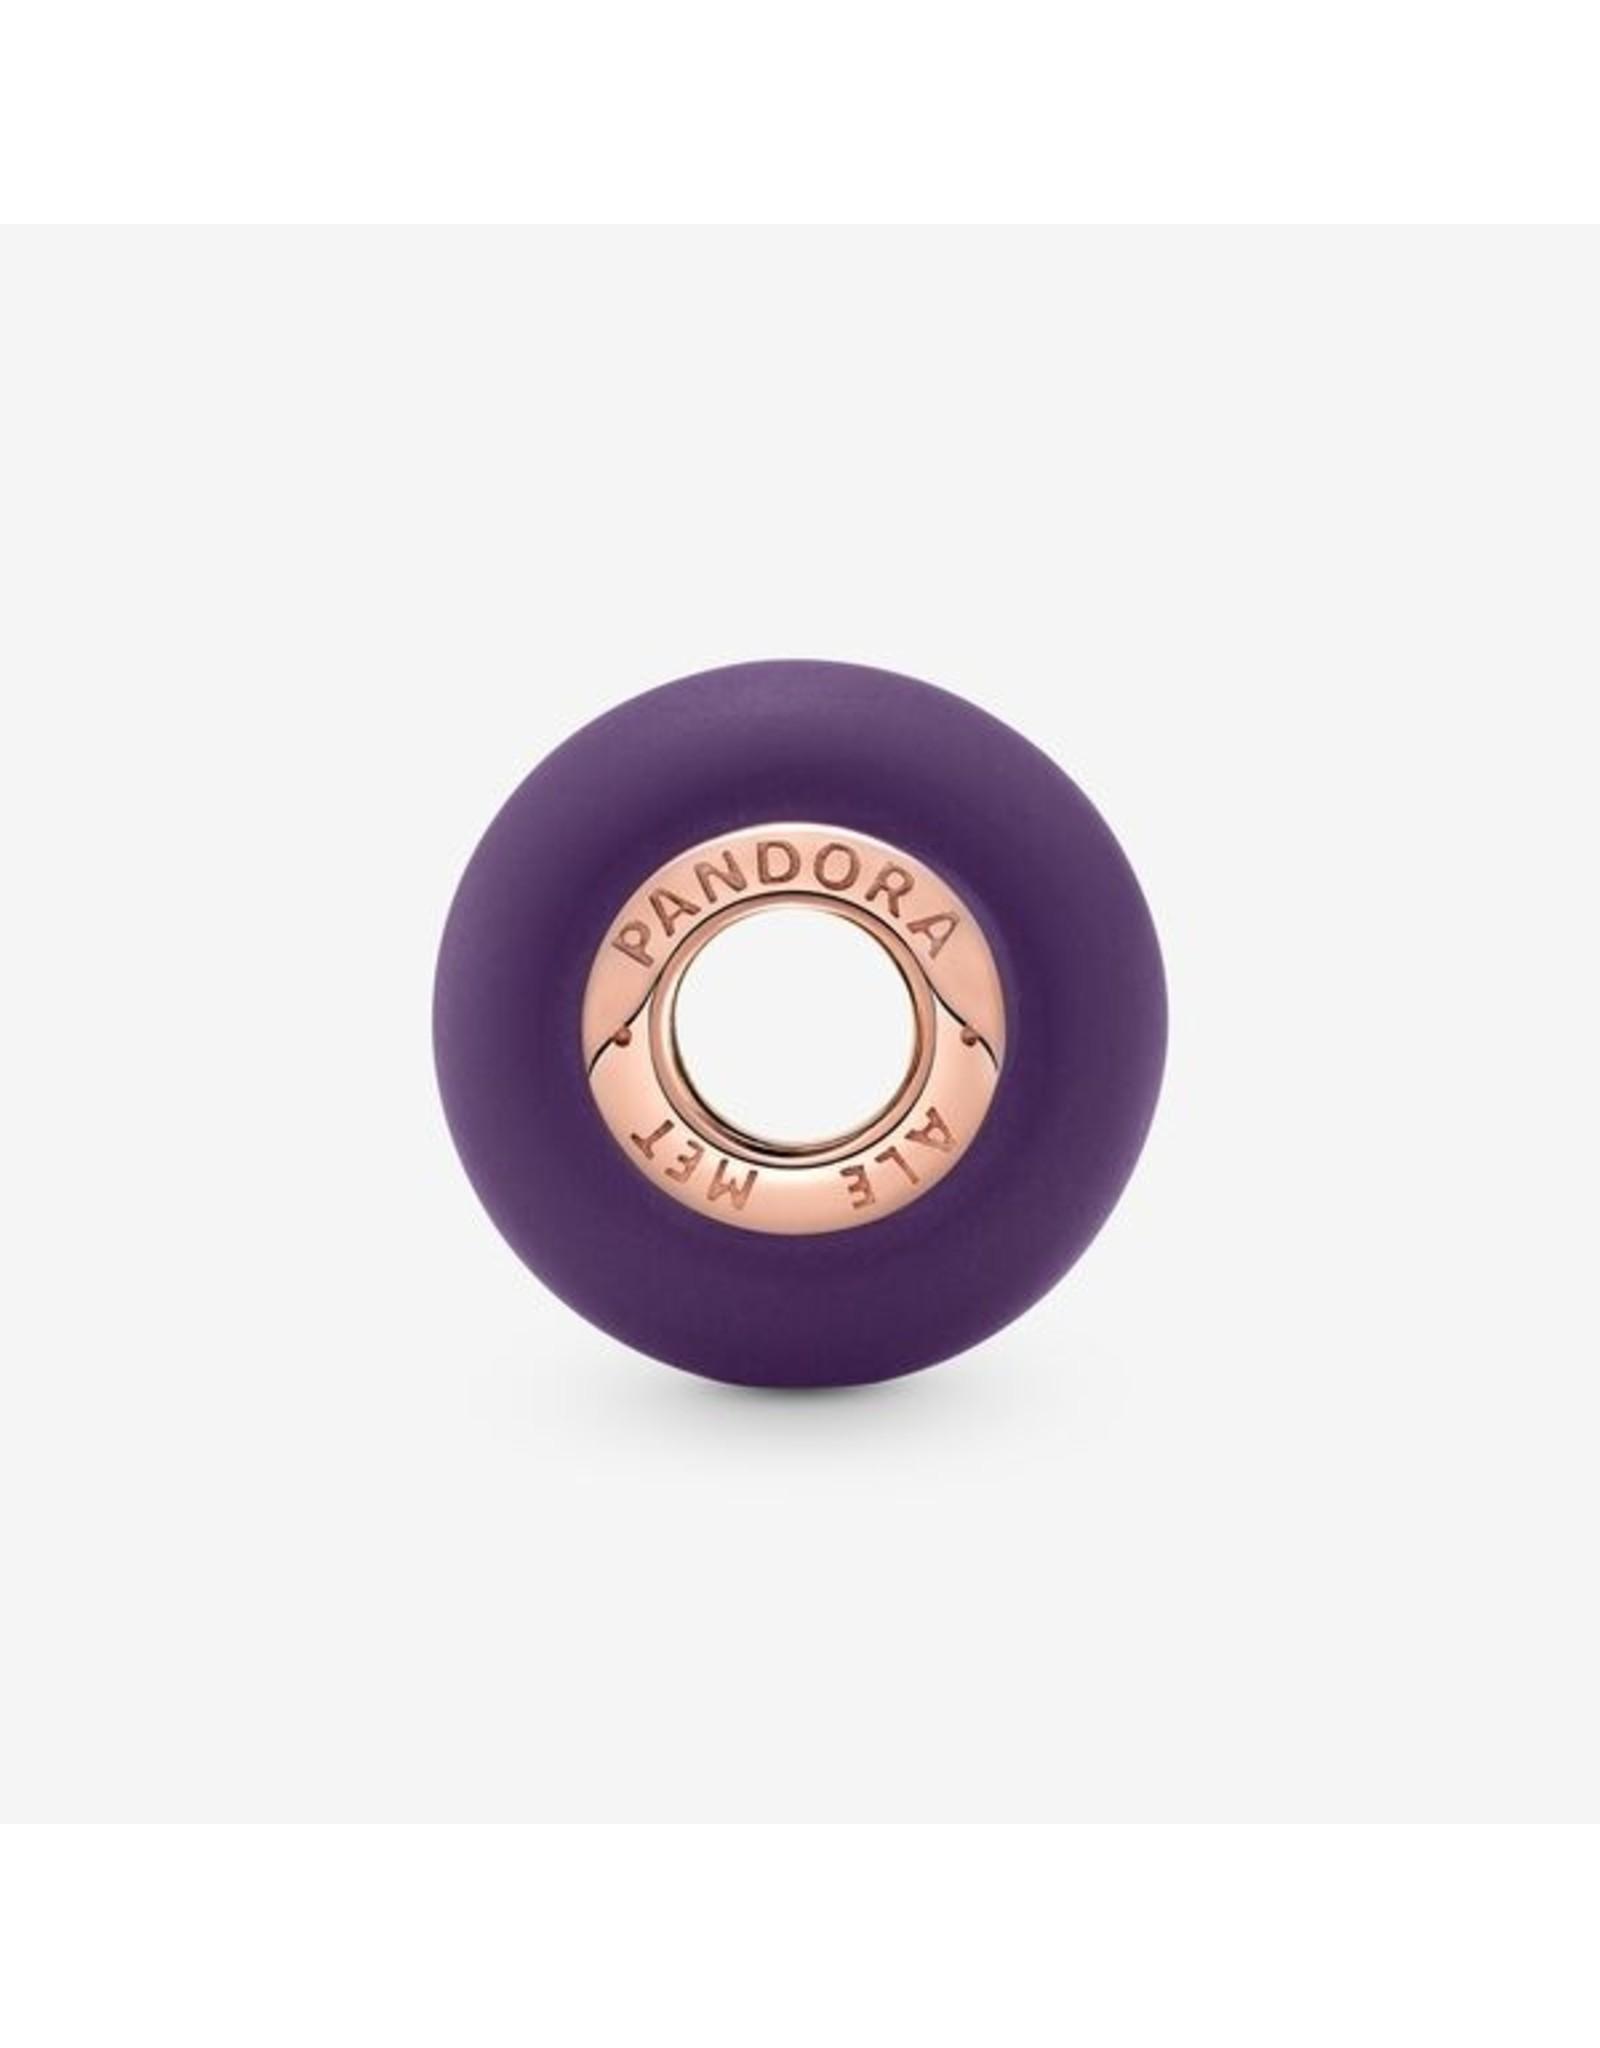 Pandora Pandora Charm, 789547C00, Matte Purple Murano Glass, Rose Gold